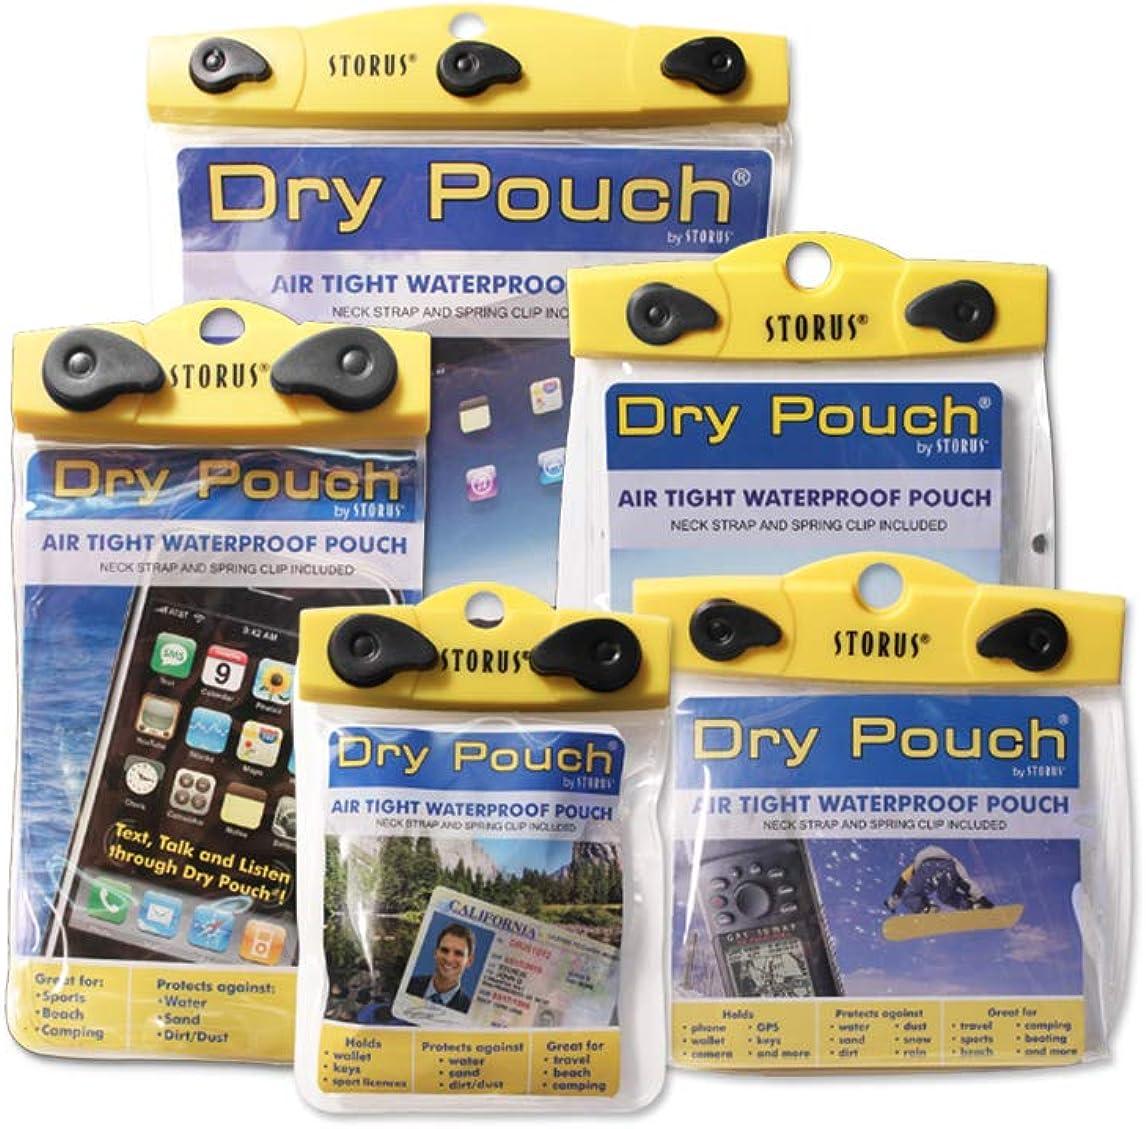 Storus Dry Pouch waterproof pouch